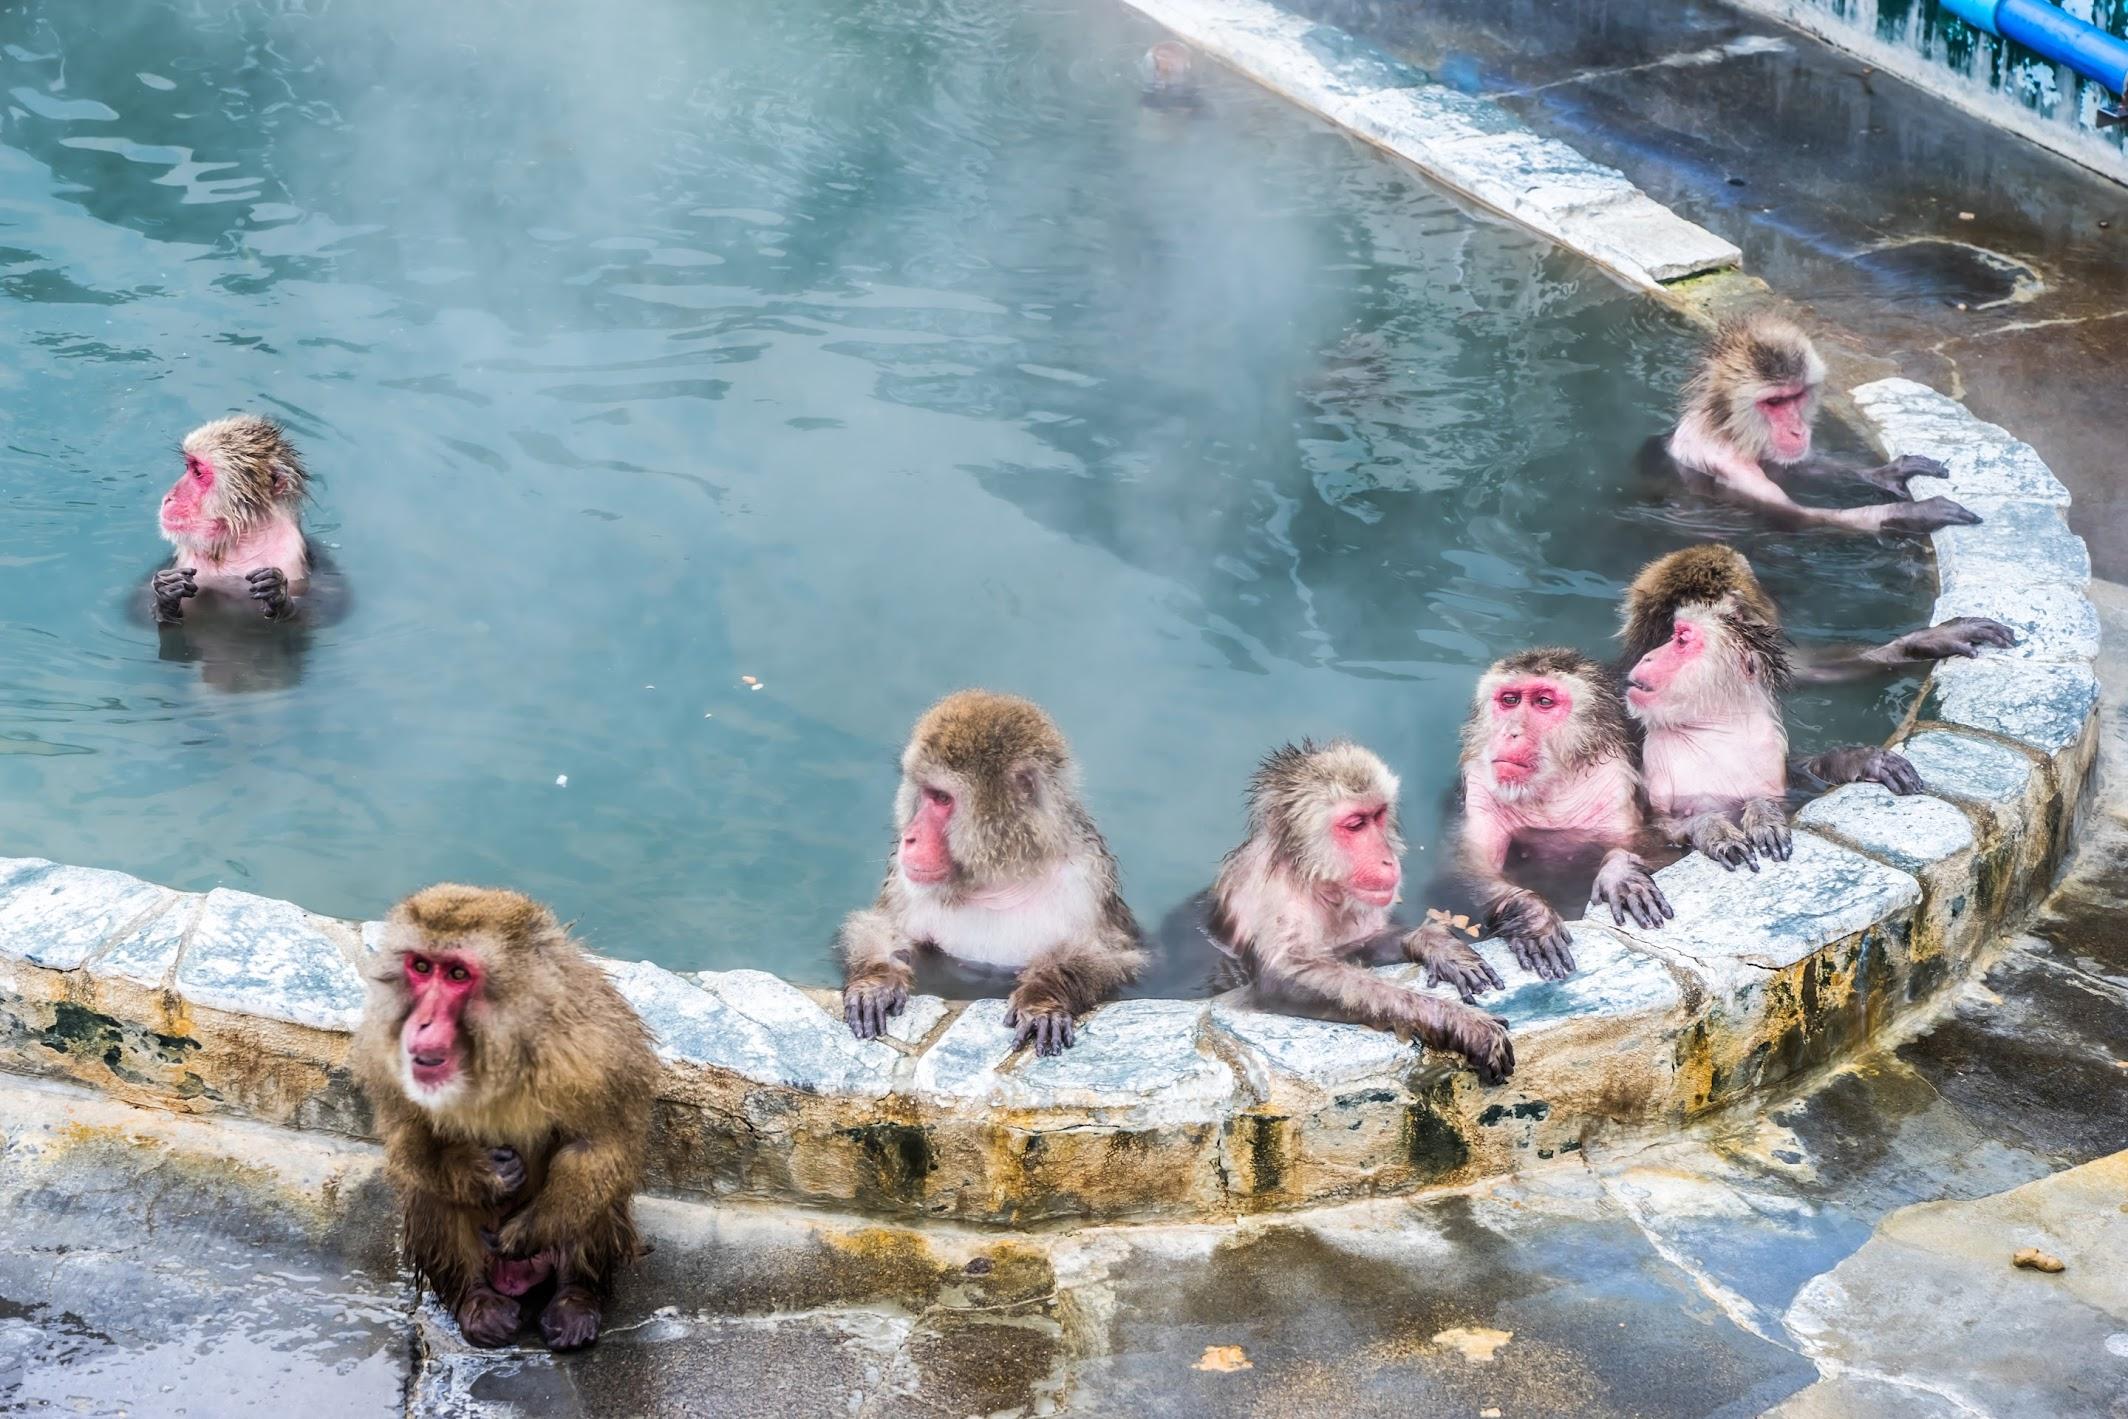 函館市熱帯植物園 サル 温泉2